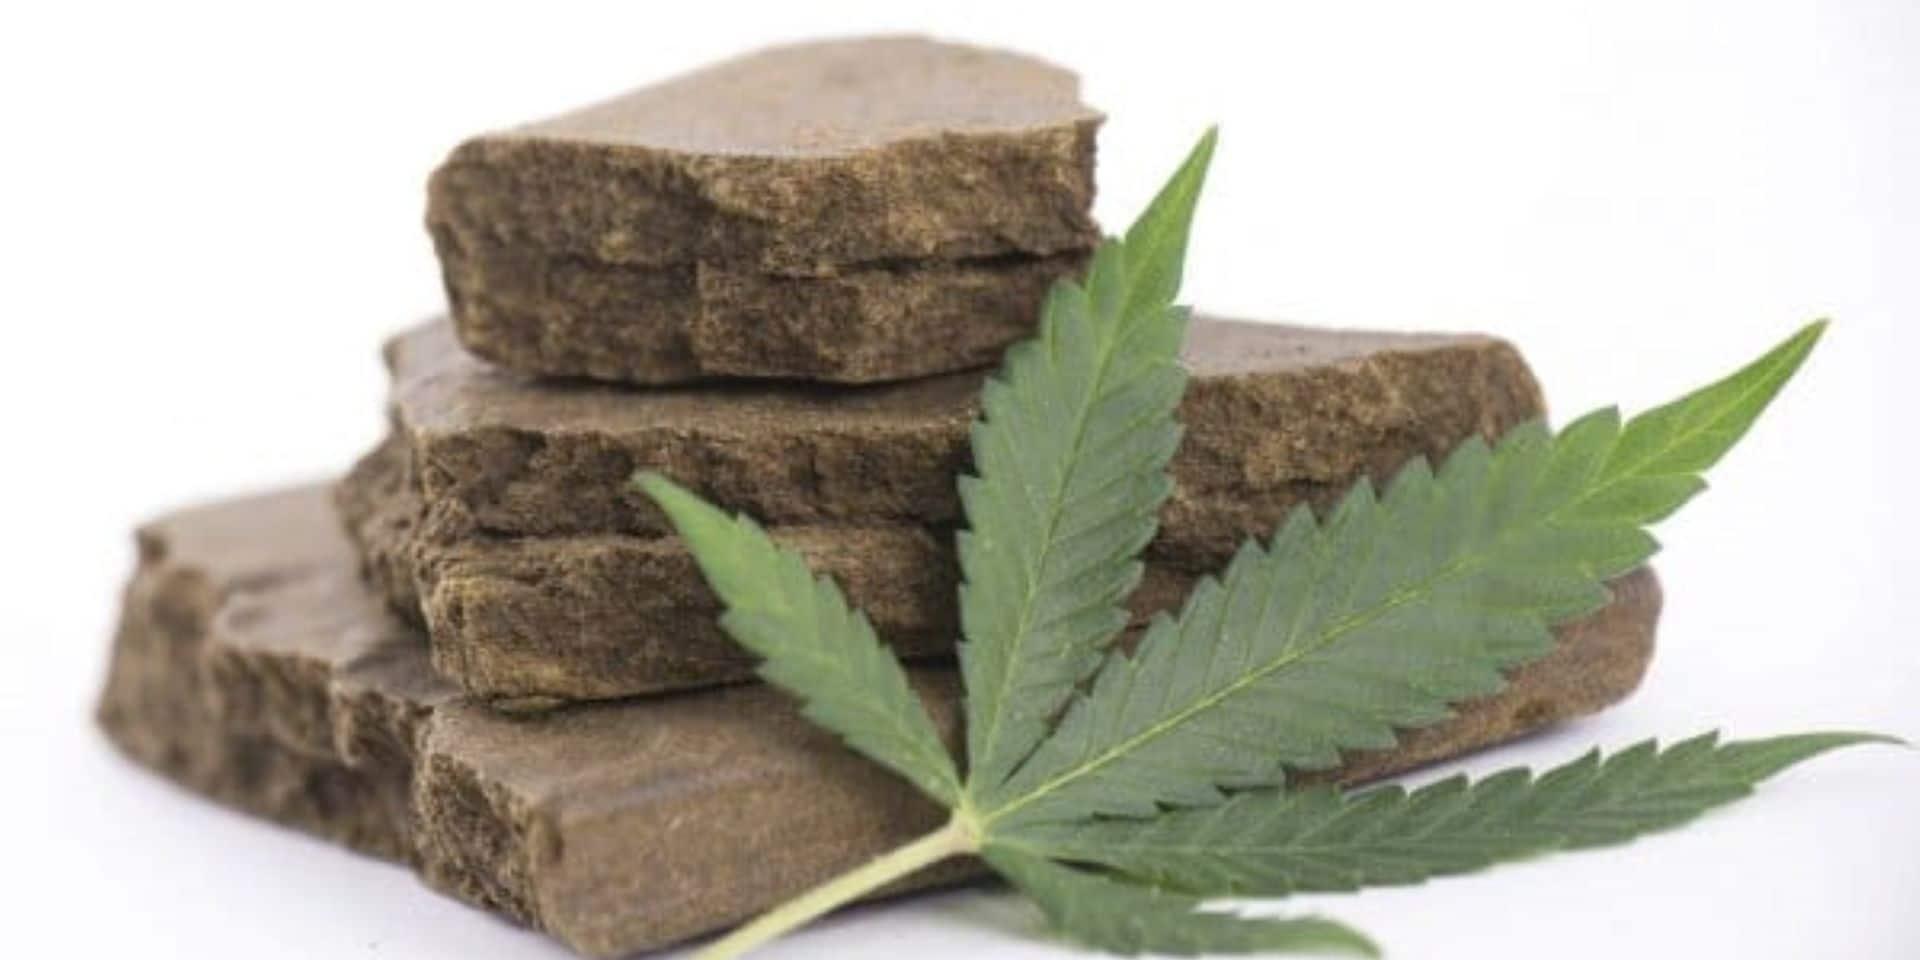 Zone de police Sud-Luxembourg : 30 kilos de cannabis saisis